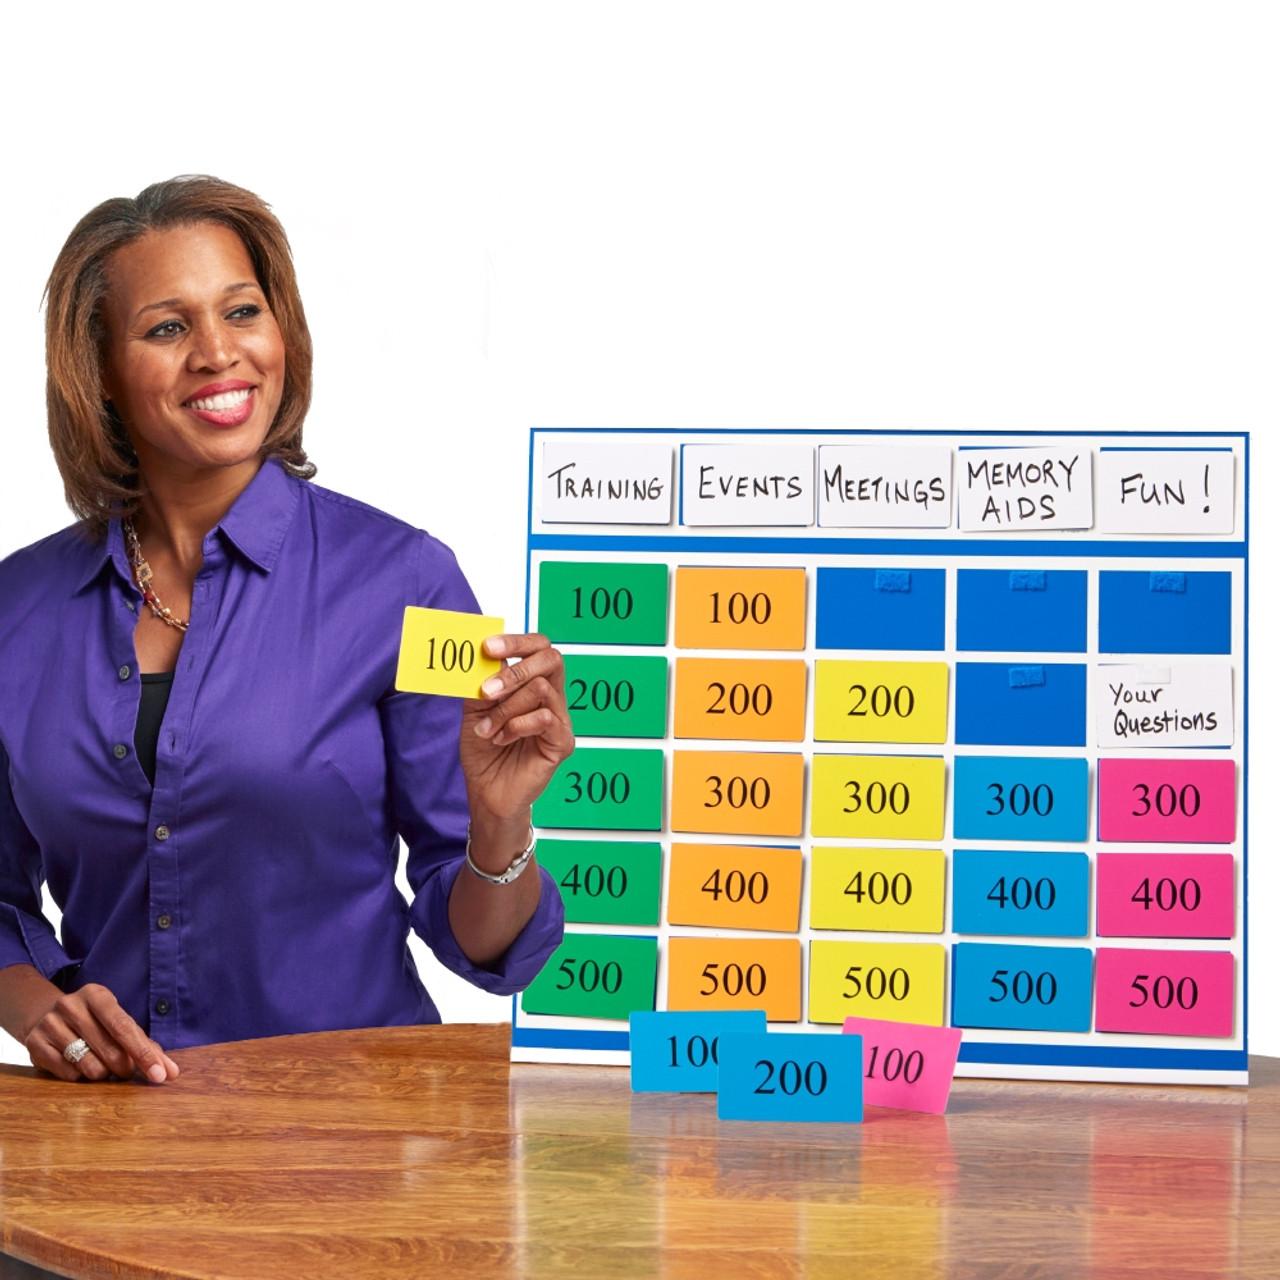 Tabletop Whaddaya Know? Game with facilitator